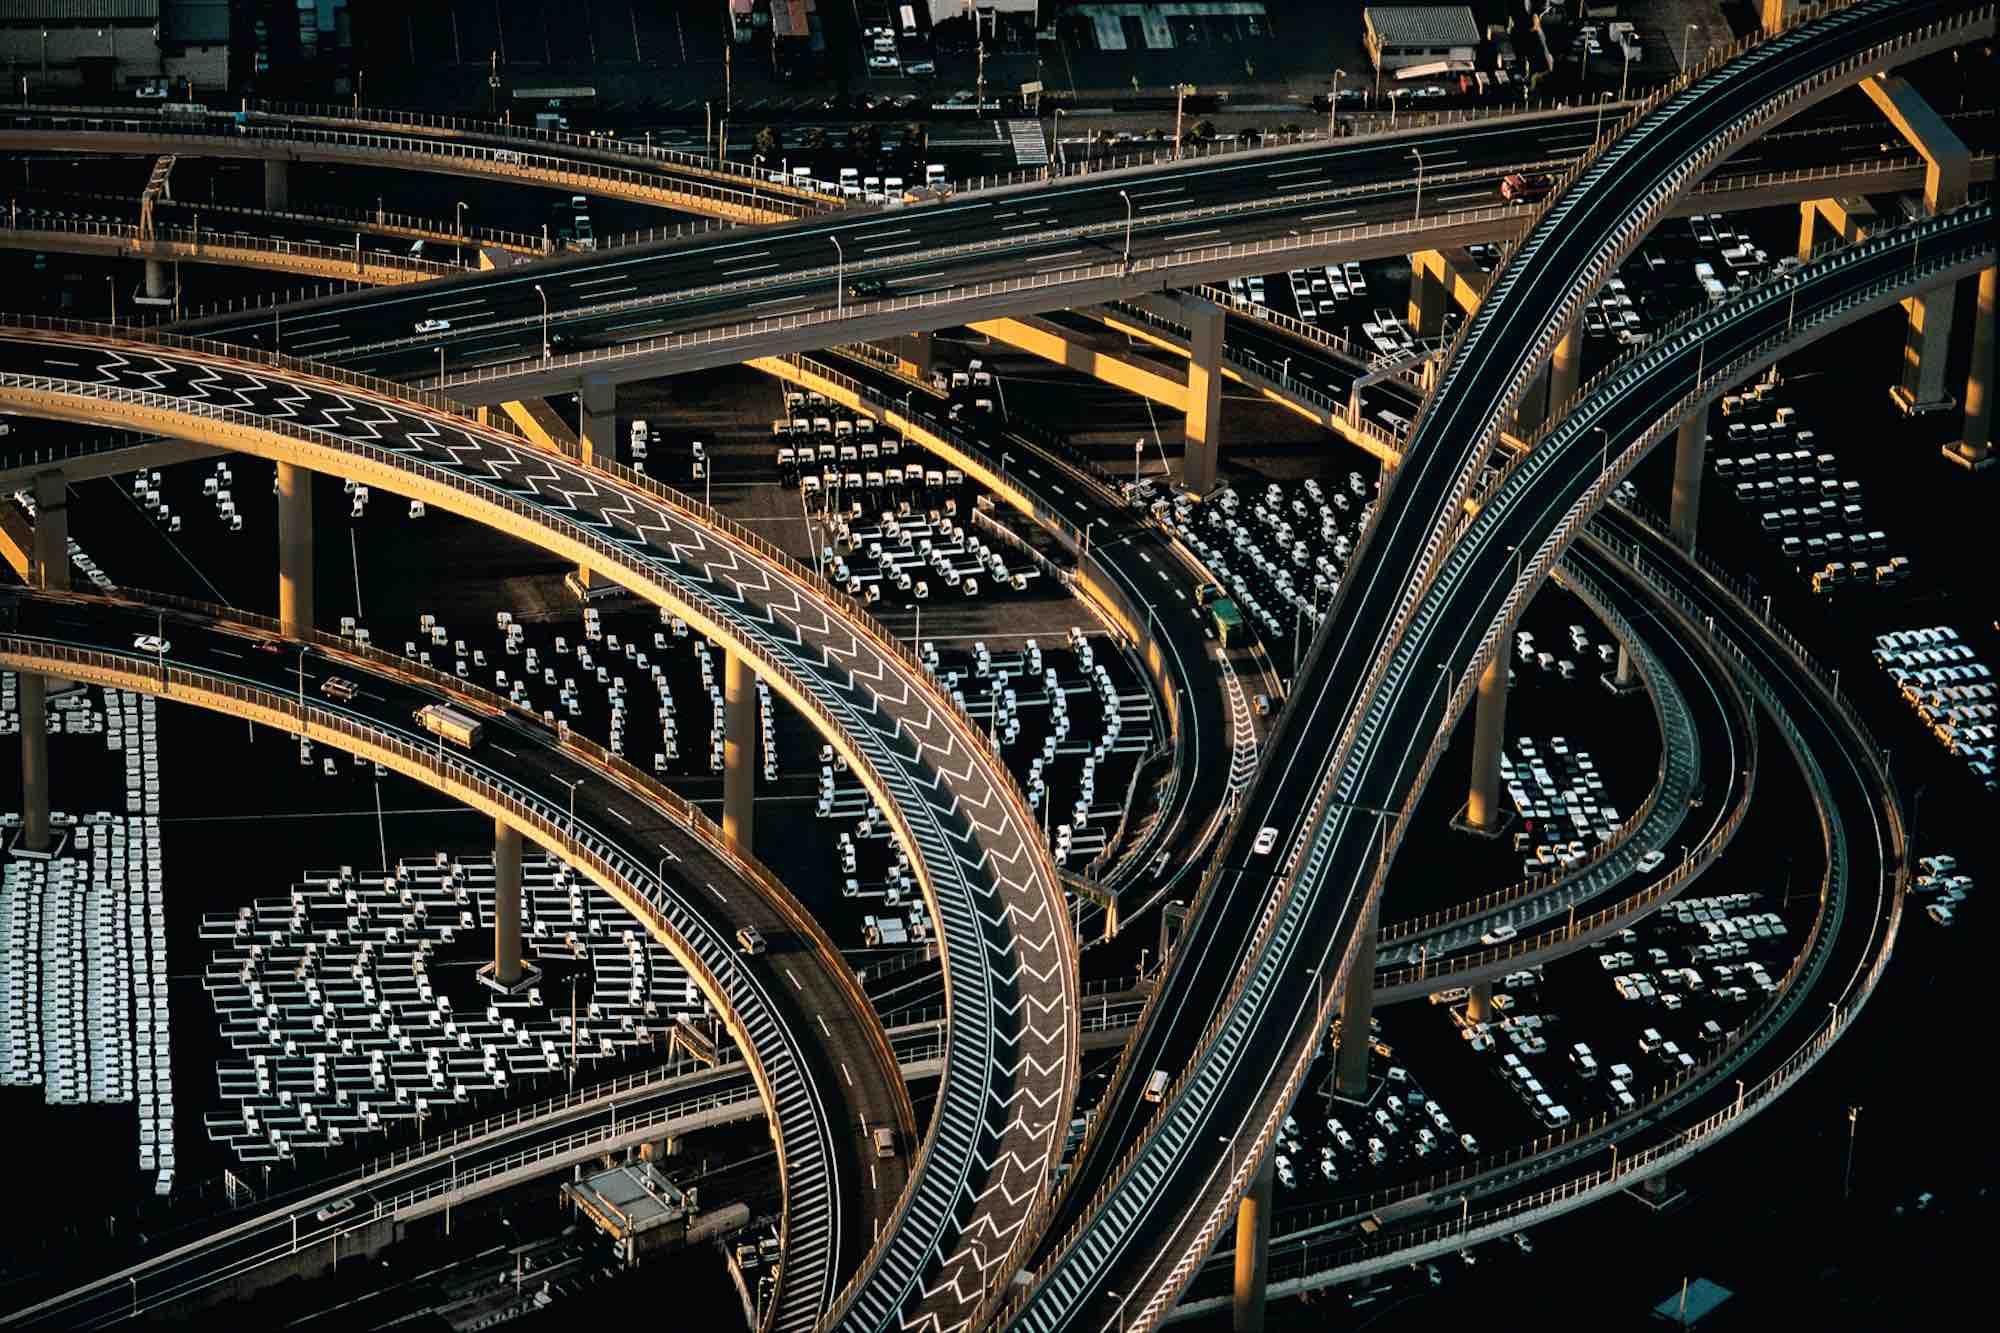 Motorway - Yann Arthus-Bertrand